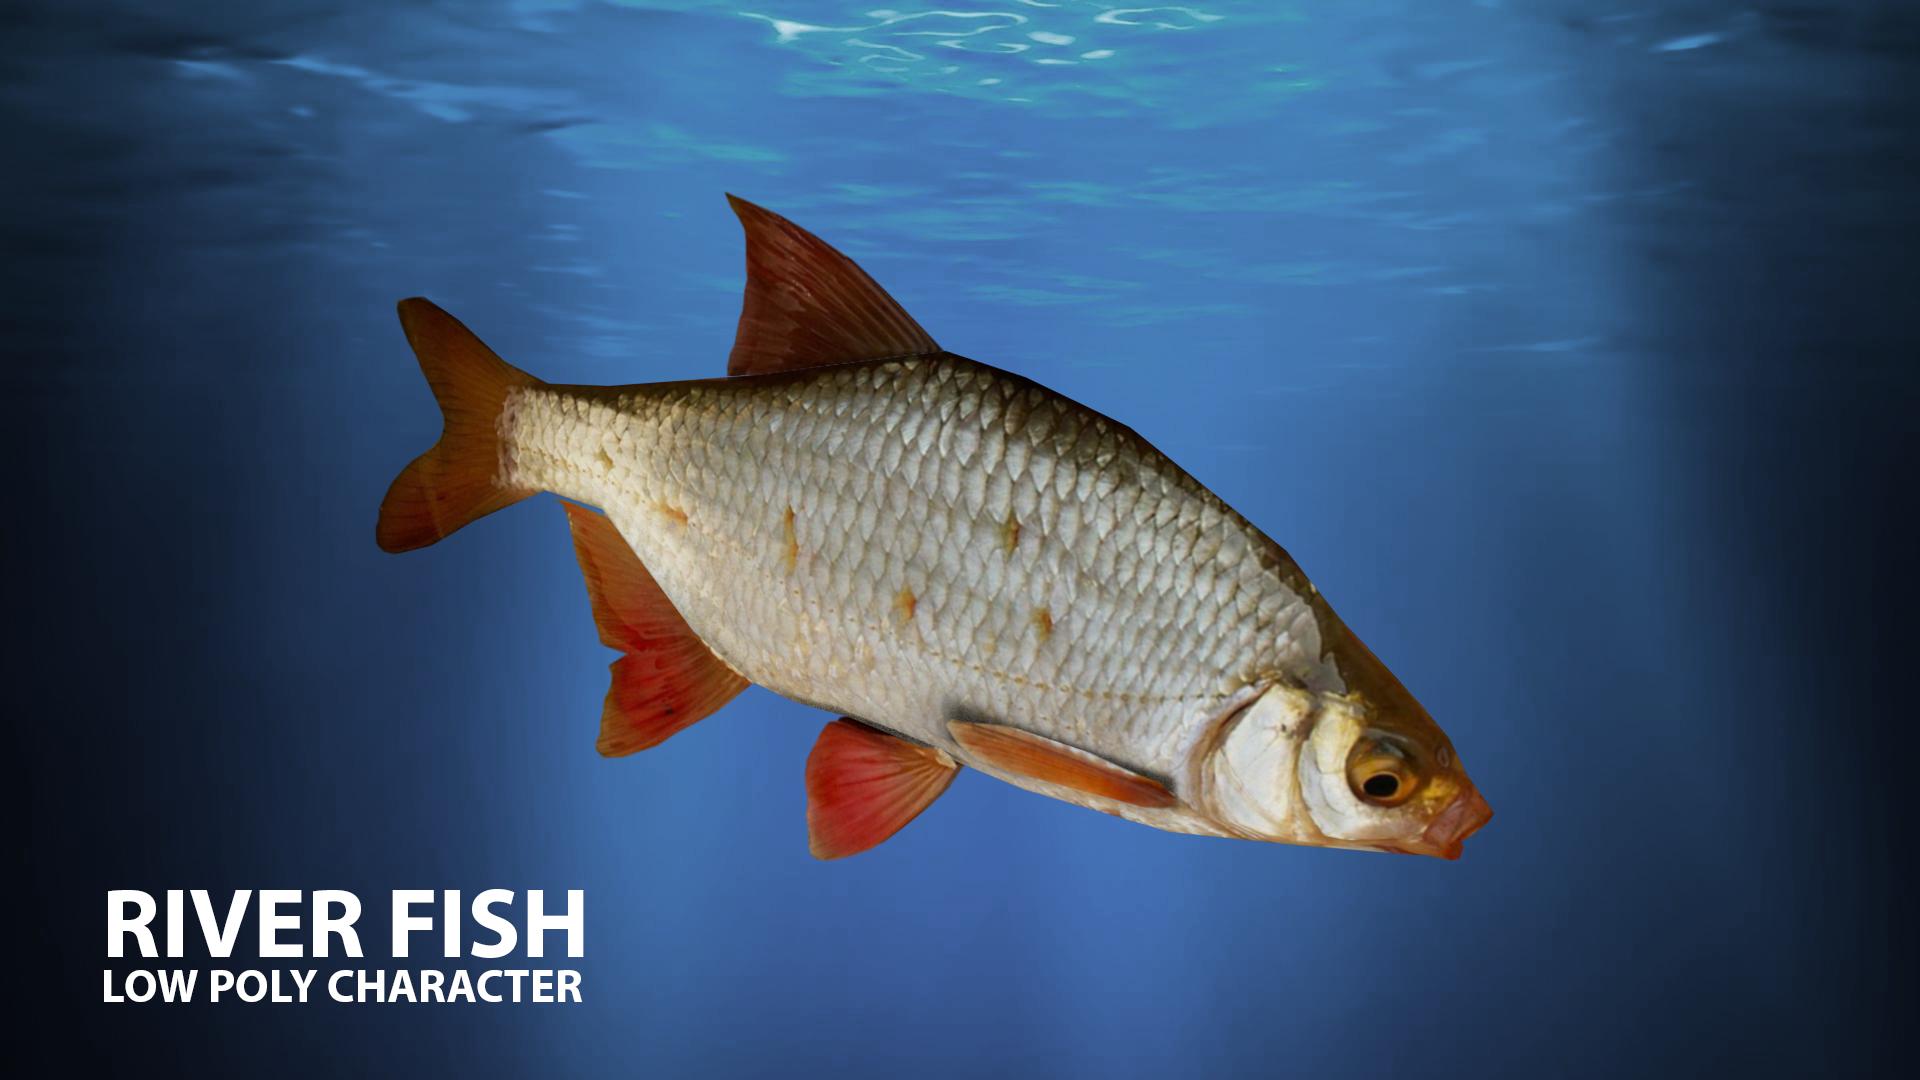 River fish Low-poly 3D model